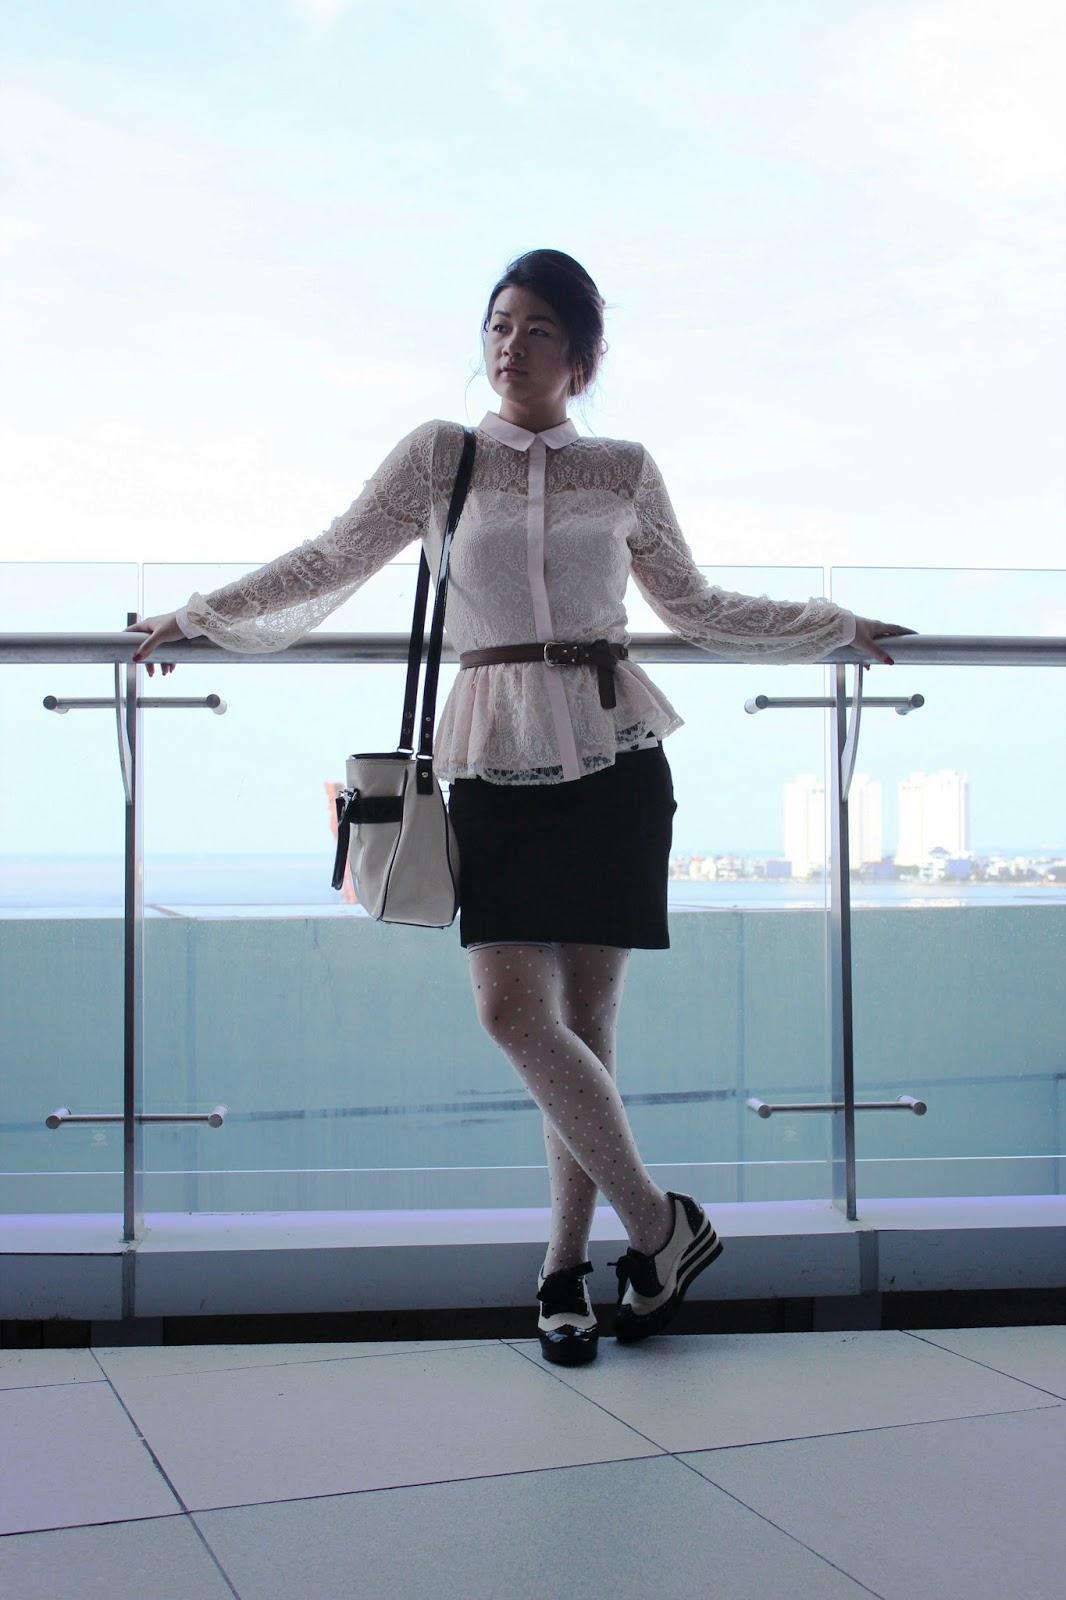 miss selfridge shirt, lace shirt, fashion blog, blogging